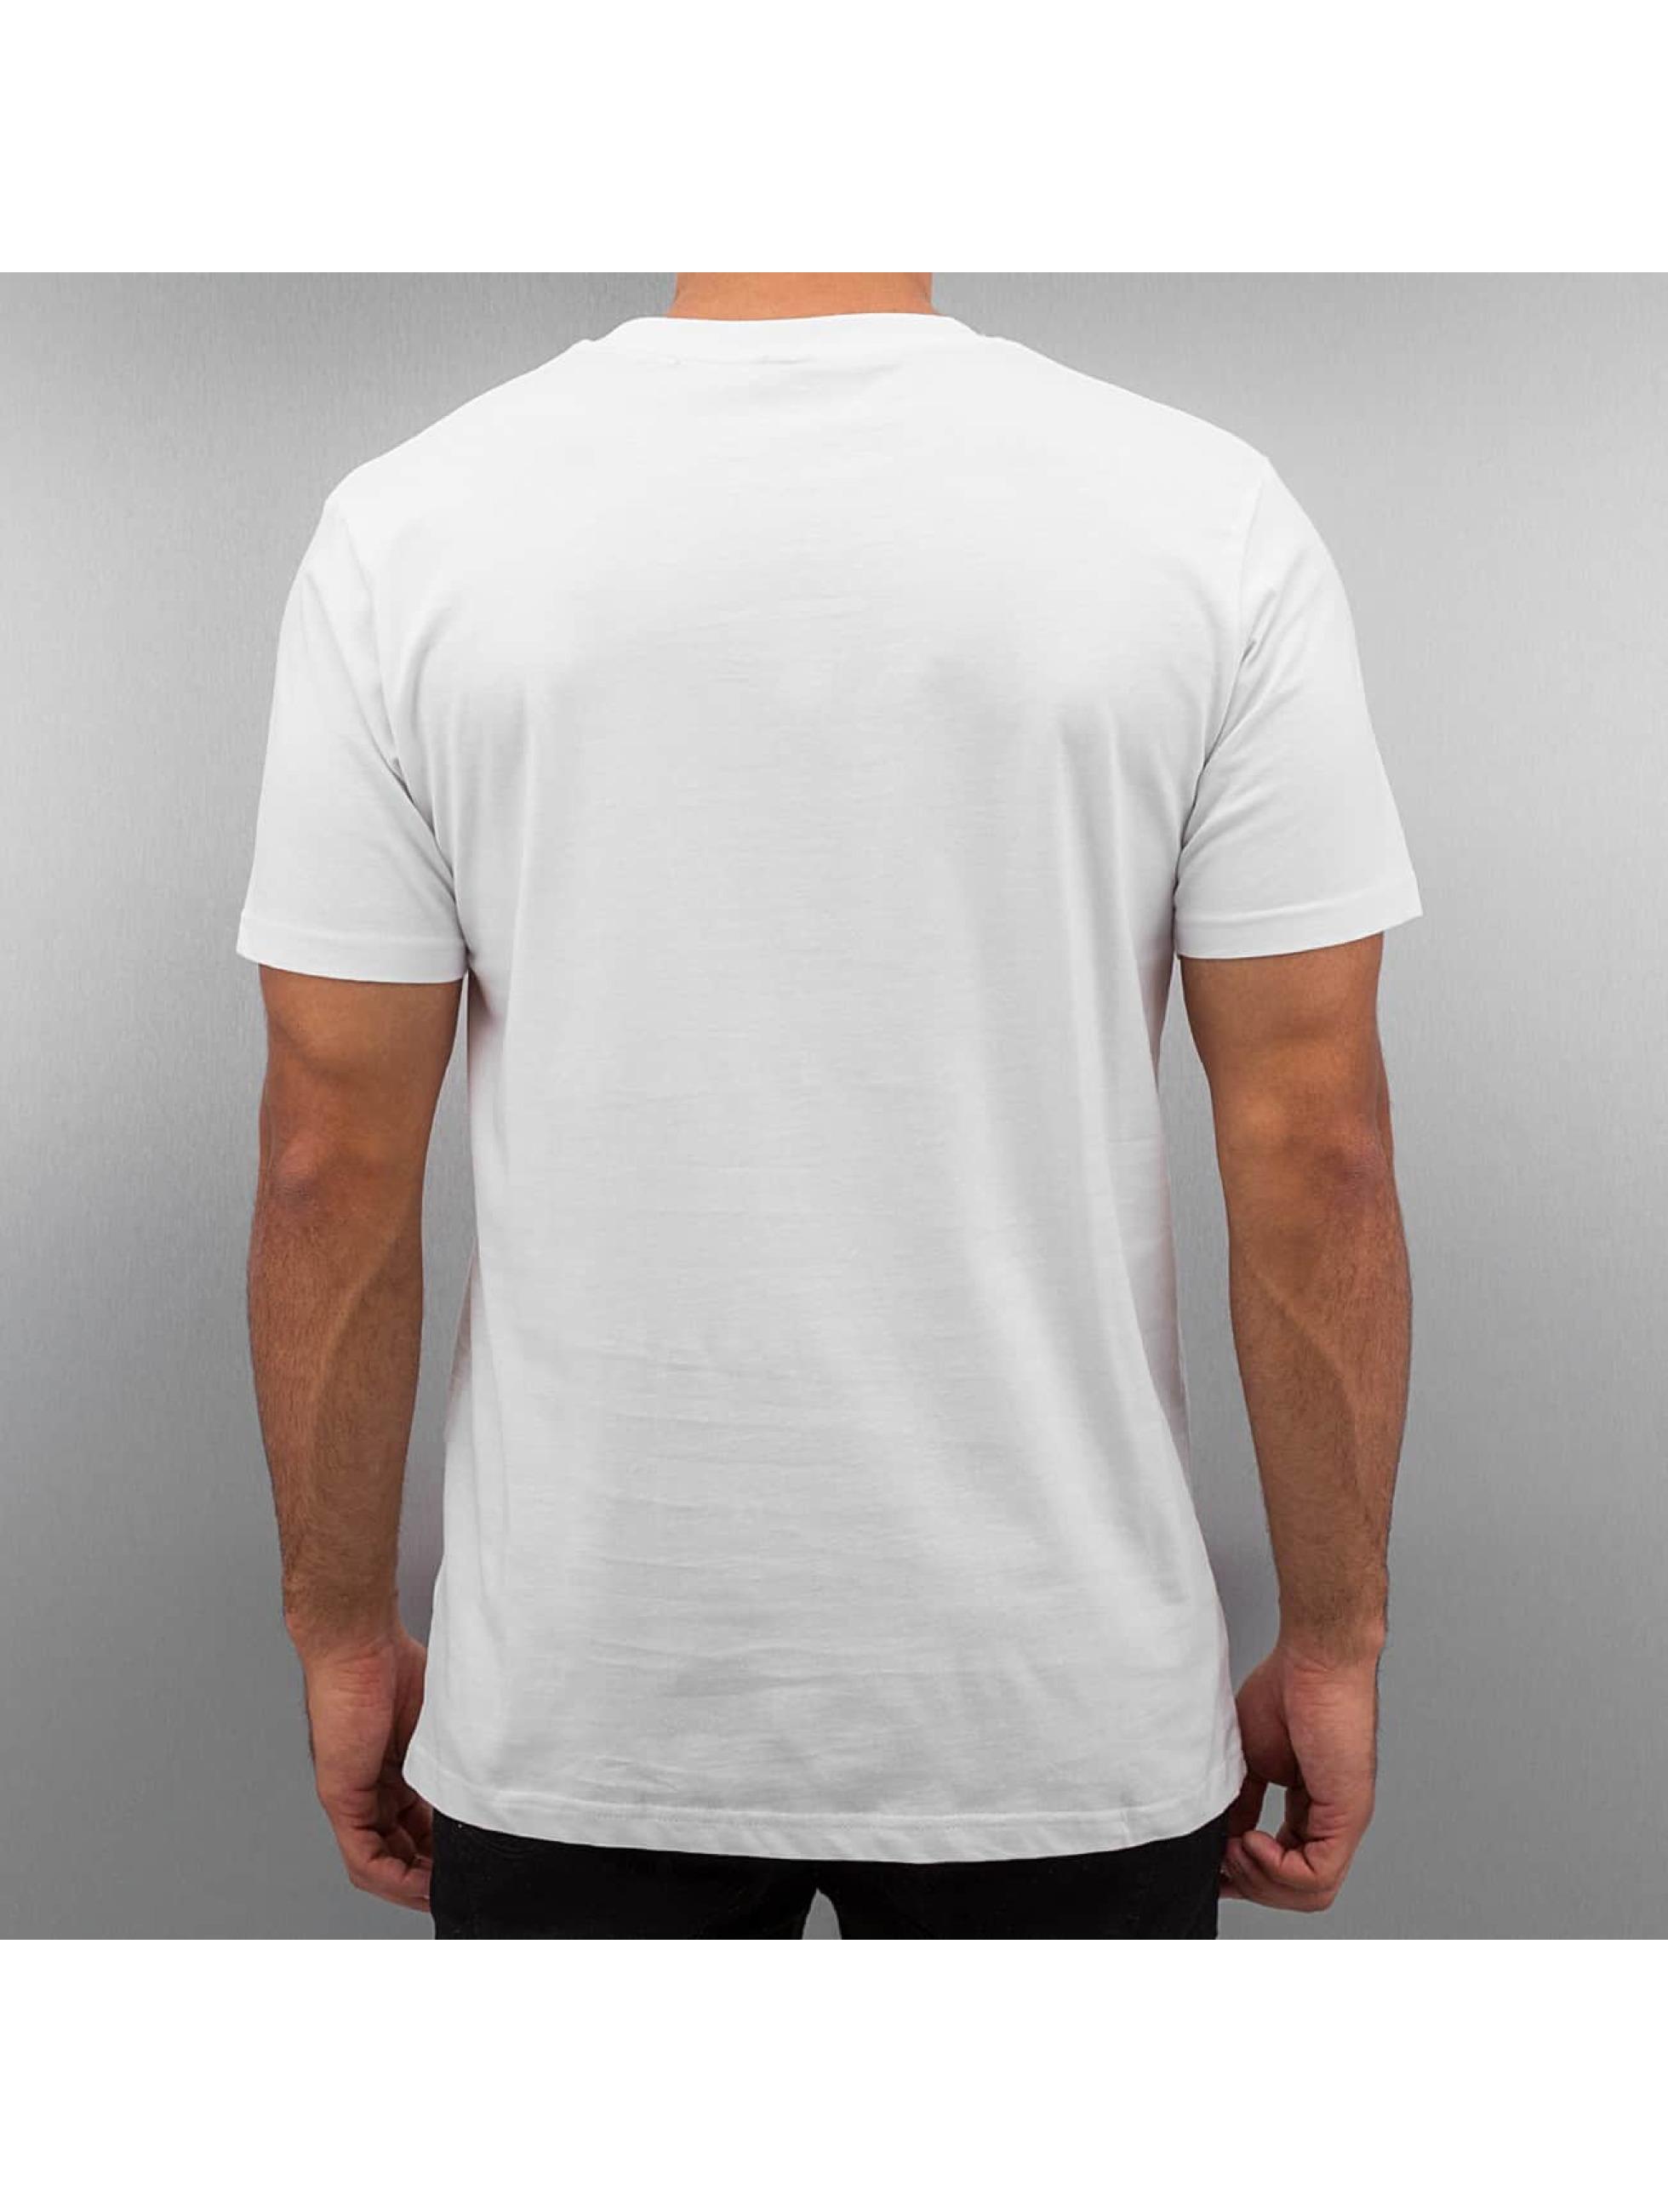 Mister Tee T-shirt Life Is Pain vit